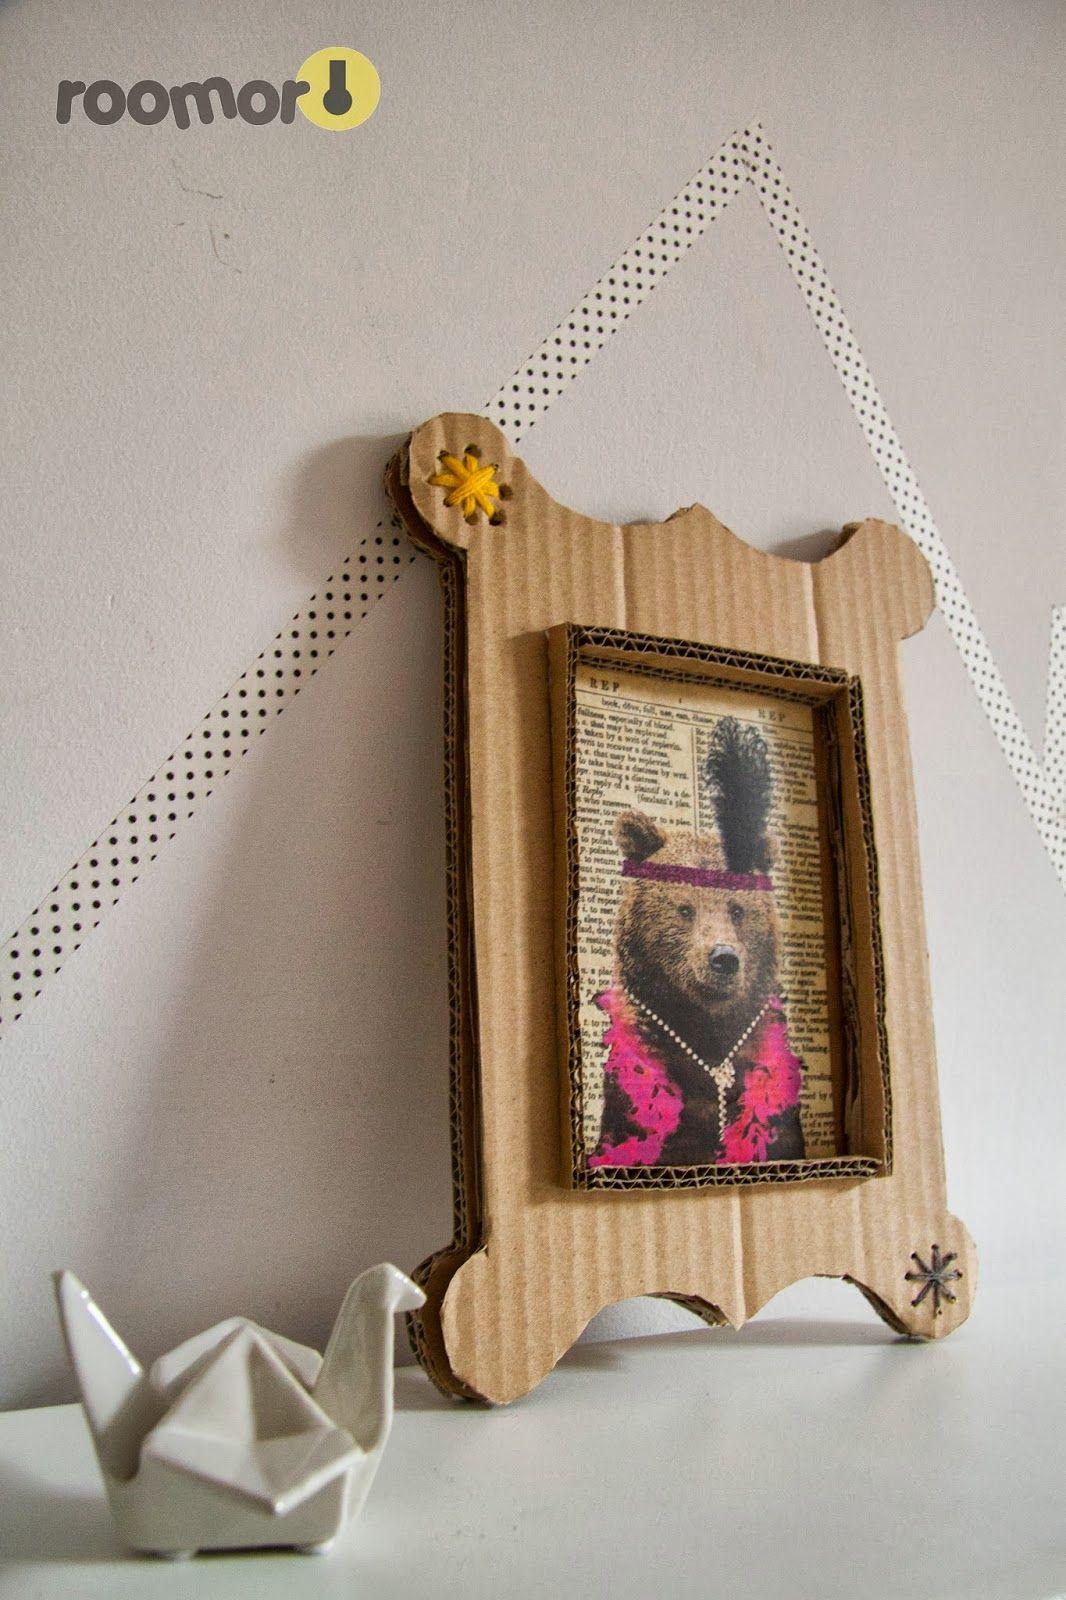 Cardboard Design Cardboard Craft Ideas Pinterest Cardboard